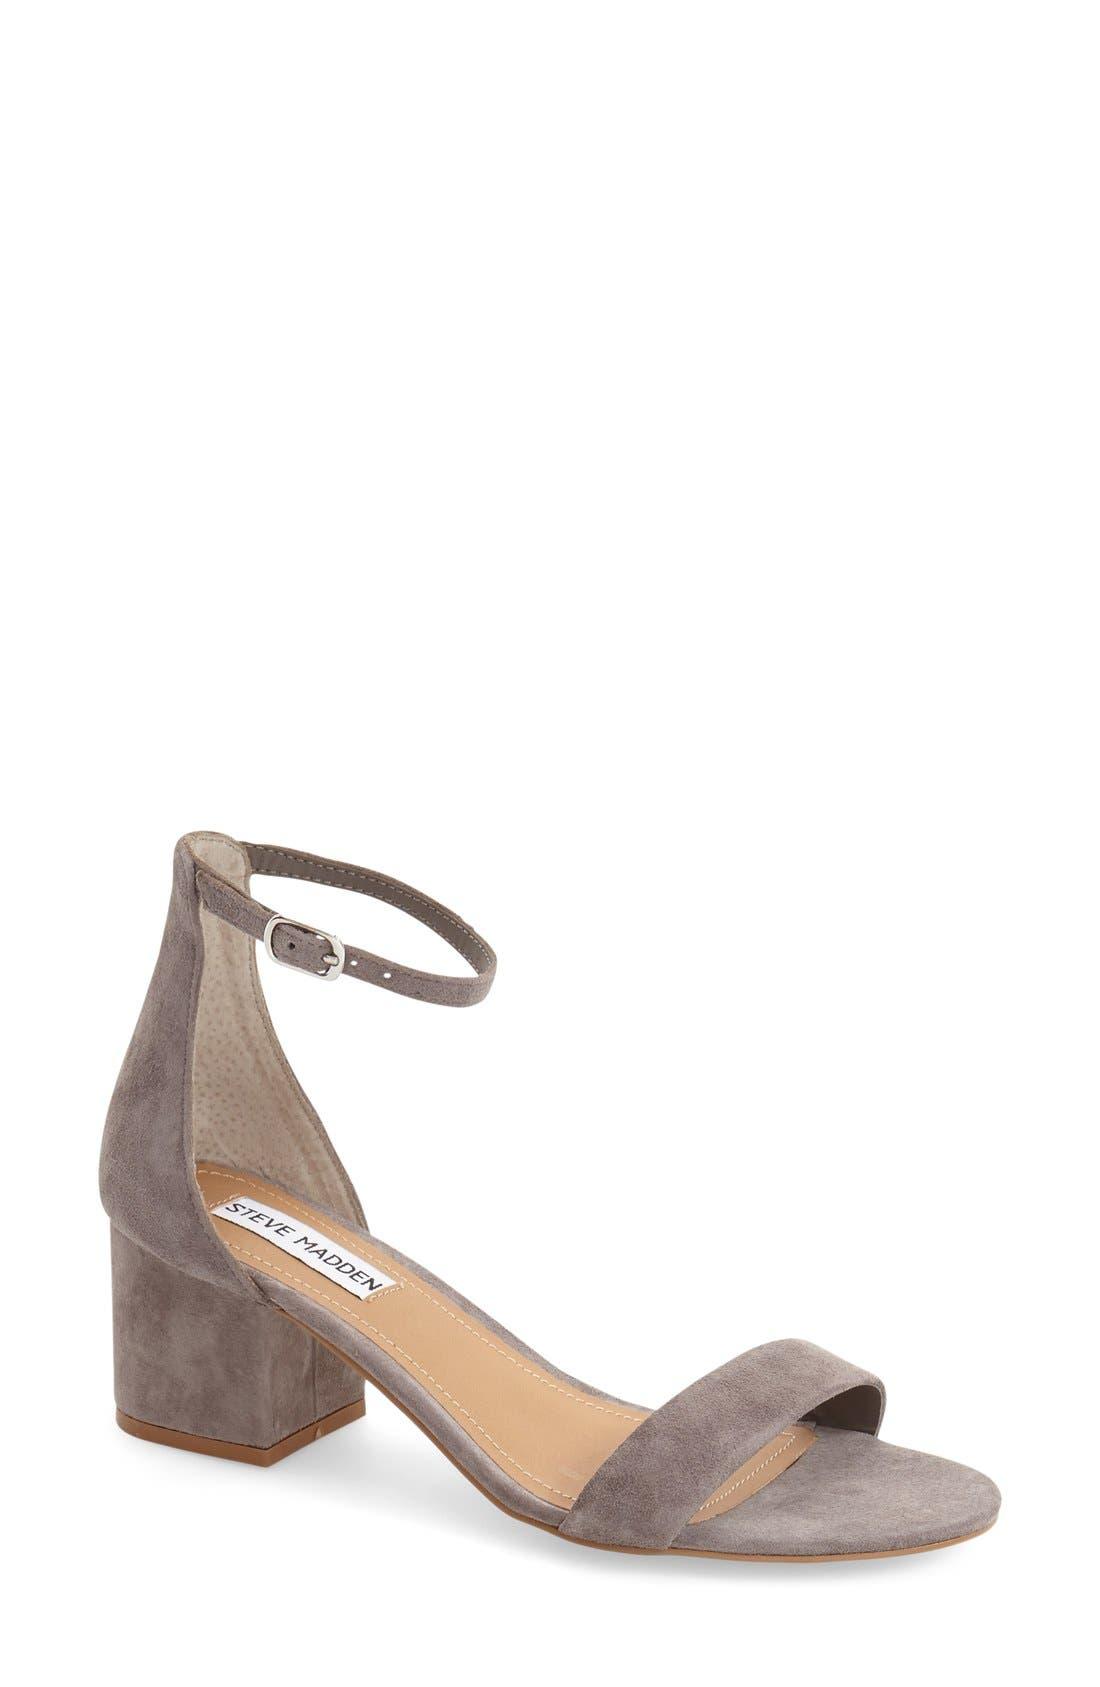 Irenee Ankle Strap Sandal,                             Main thumbnail 15, color,